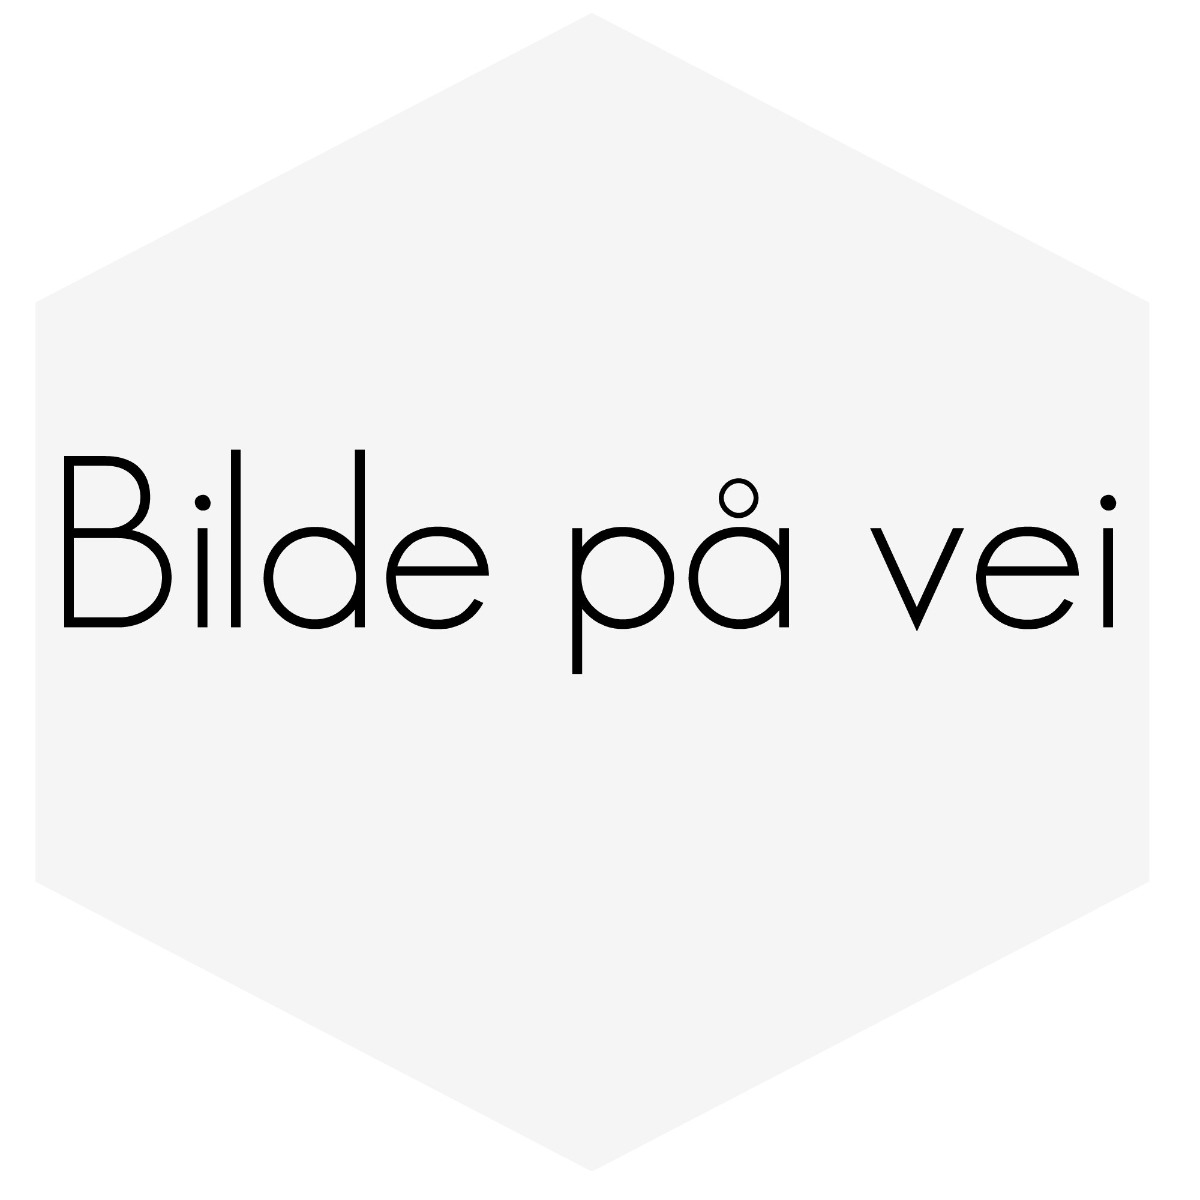 REP.PLATE V/STØTDEMPER BAK 100/200-67-93 VENSTRE